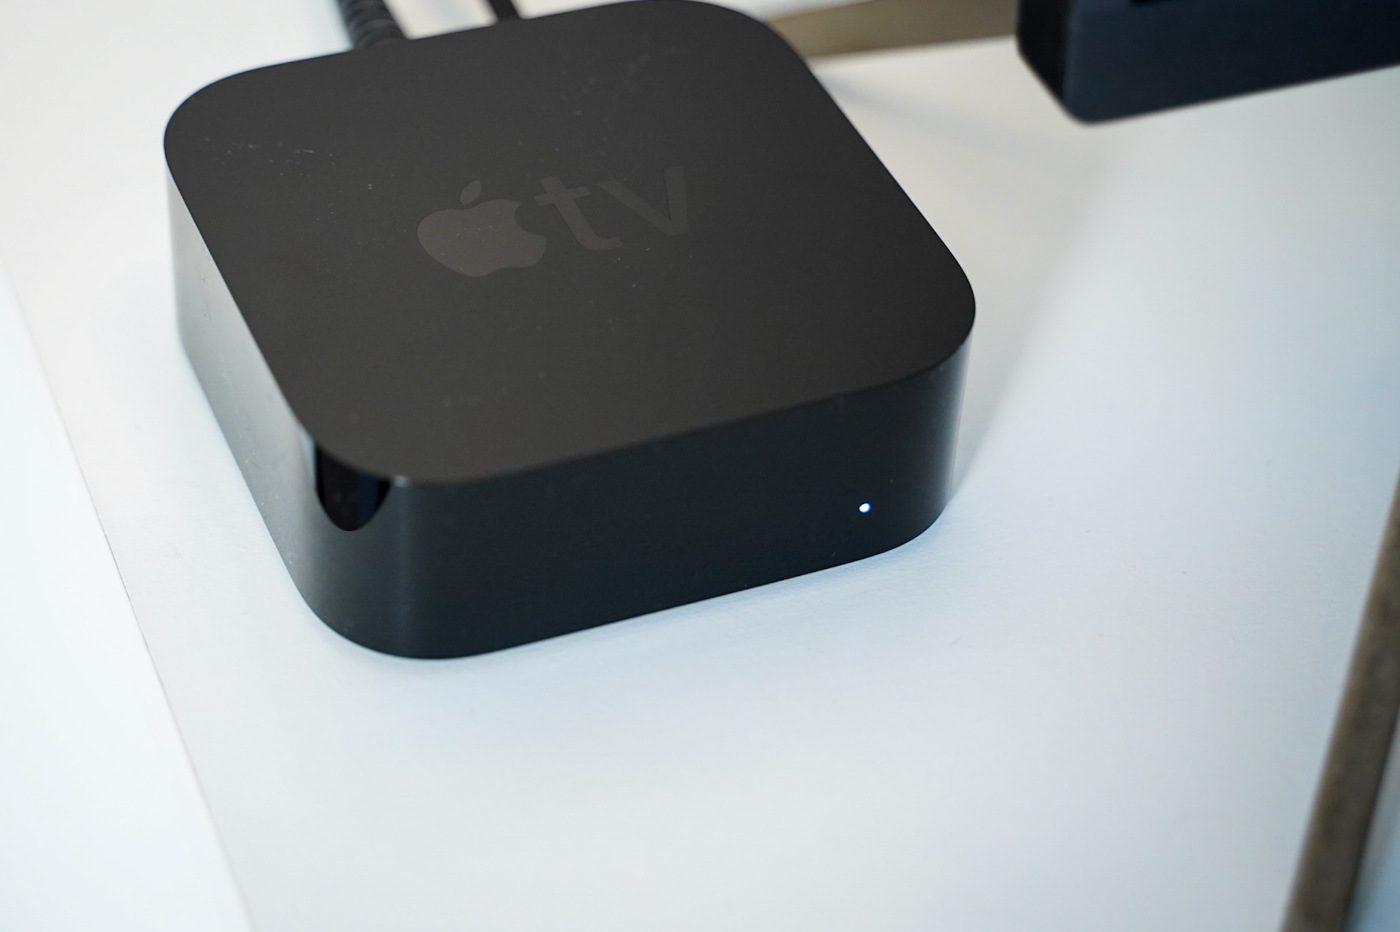 test apple tv 4K 2021 design